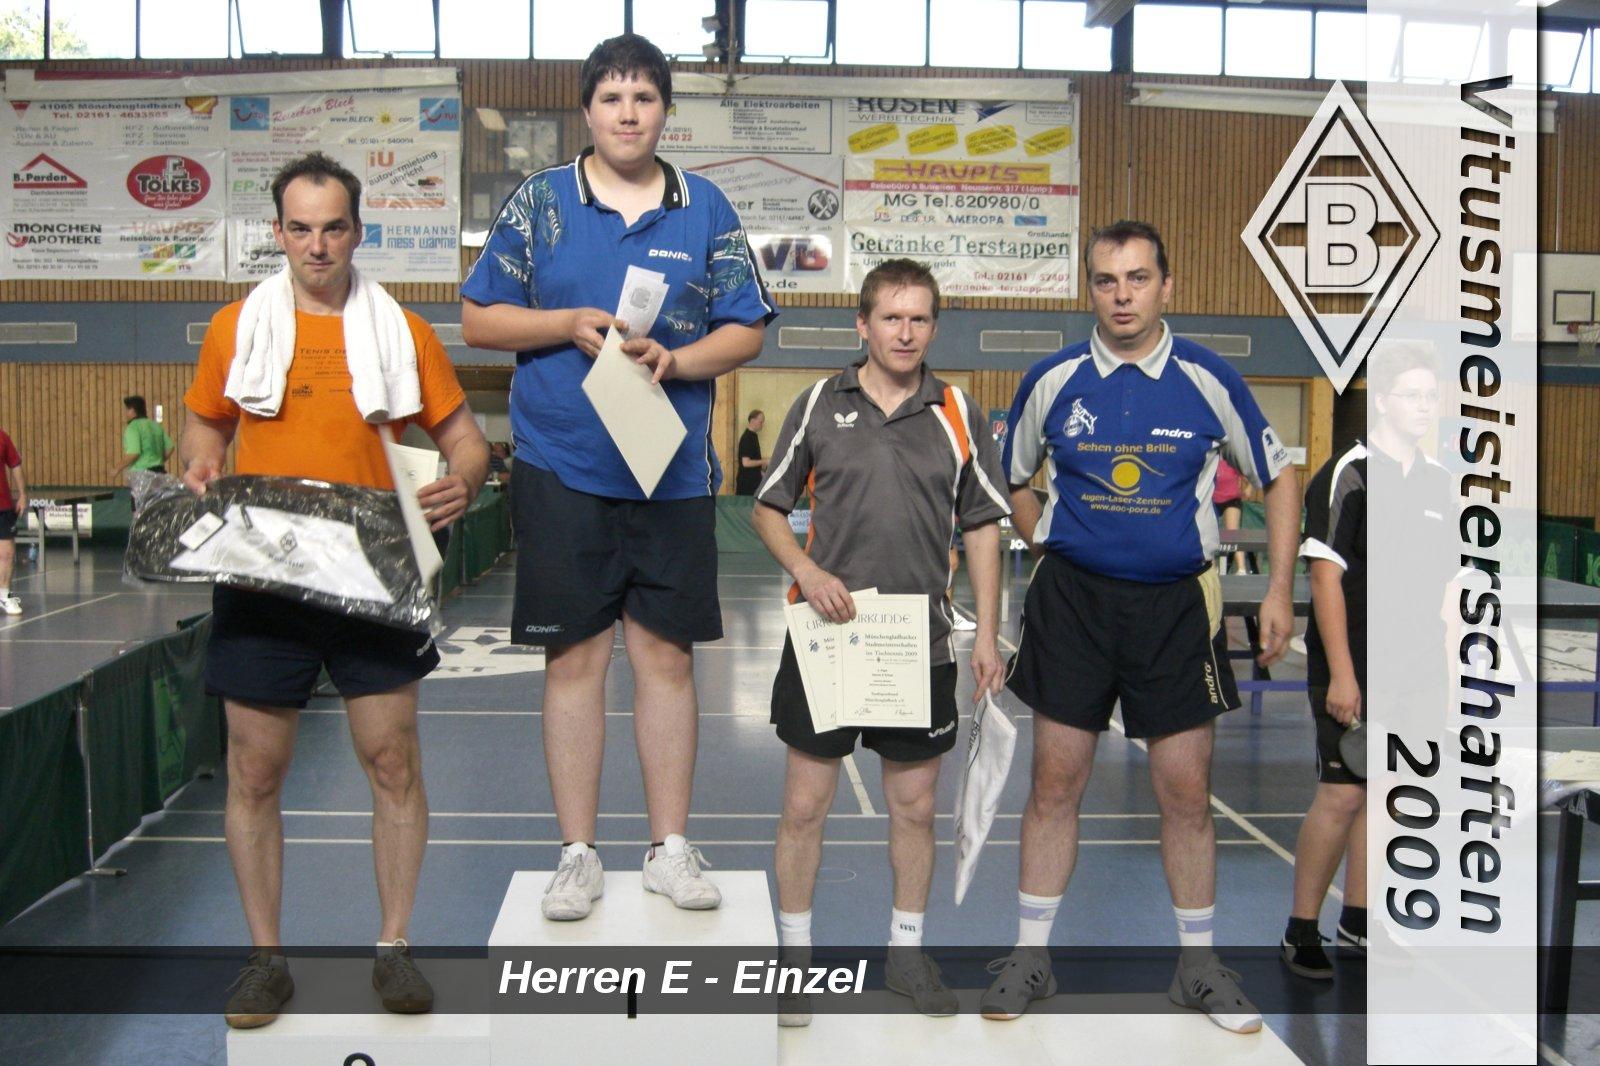 VM2009-HerrenE-Einzel